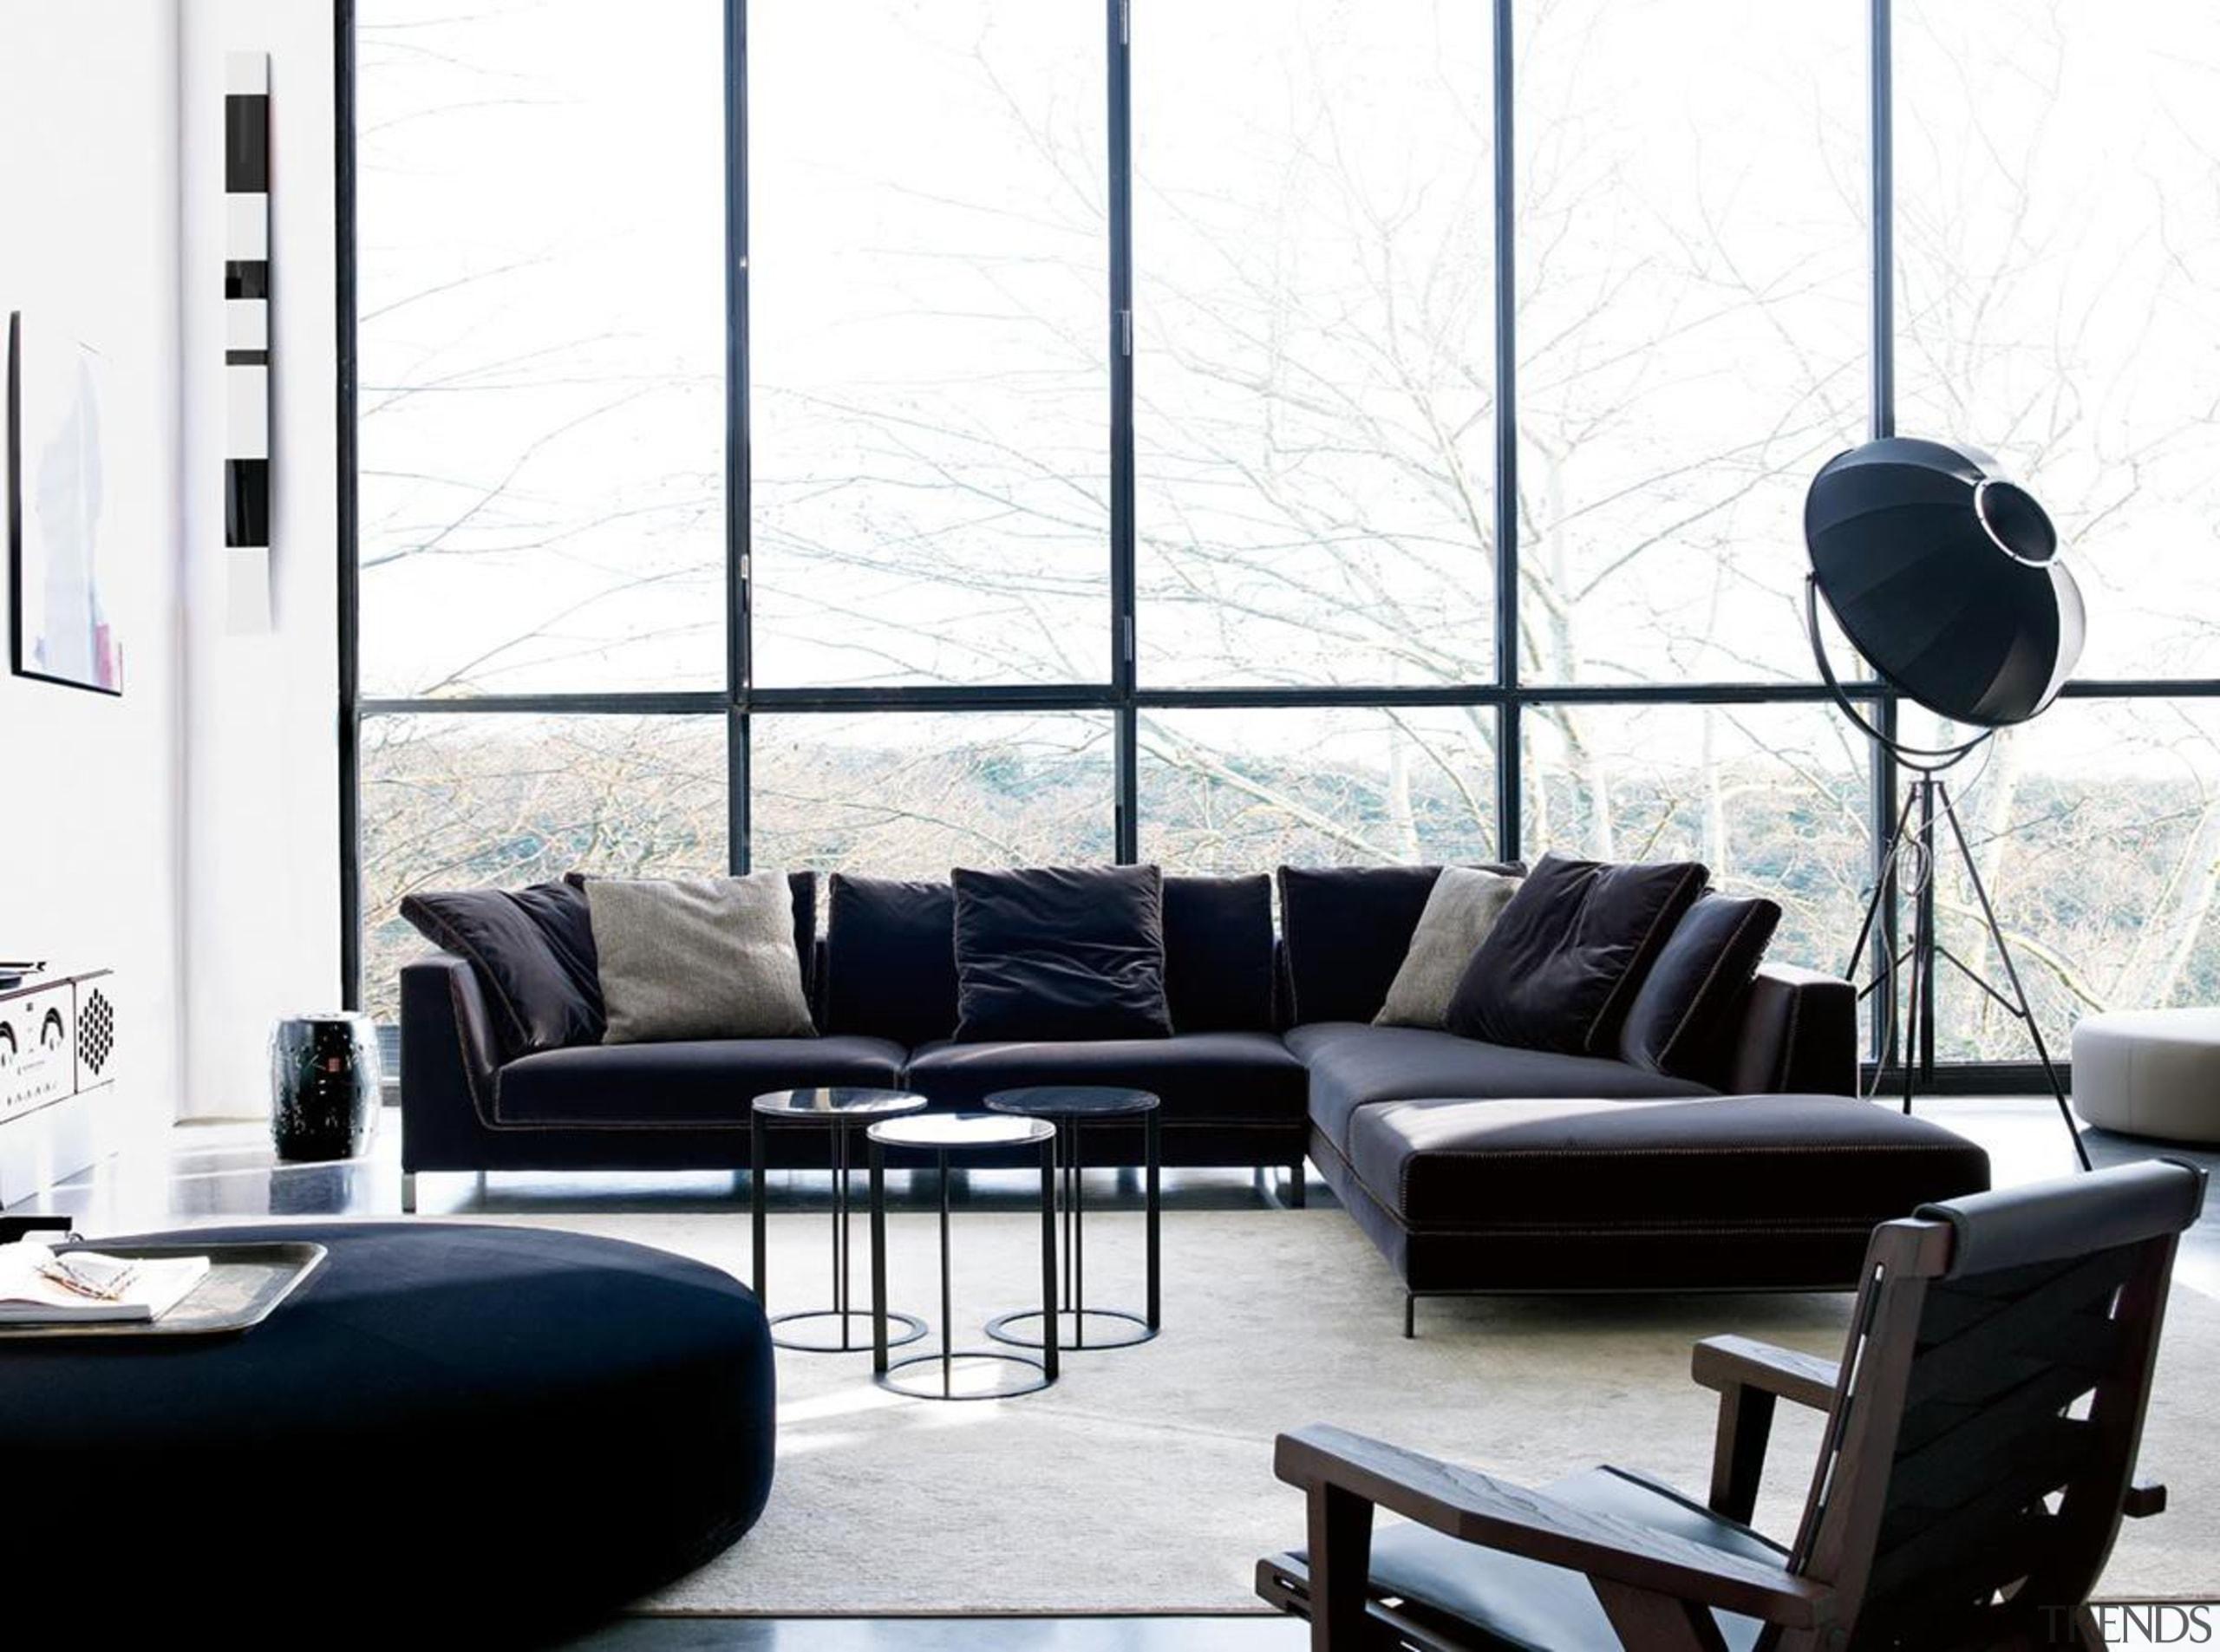 bebitaliacitterioraysofablackinstu1200.jpg - bebitaliacitterioraysofablackinstu1200.jpg - angle   couch   angle, couch, furniture, interior design, living room, product design, table, window, white, black